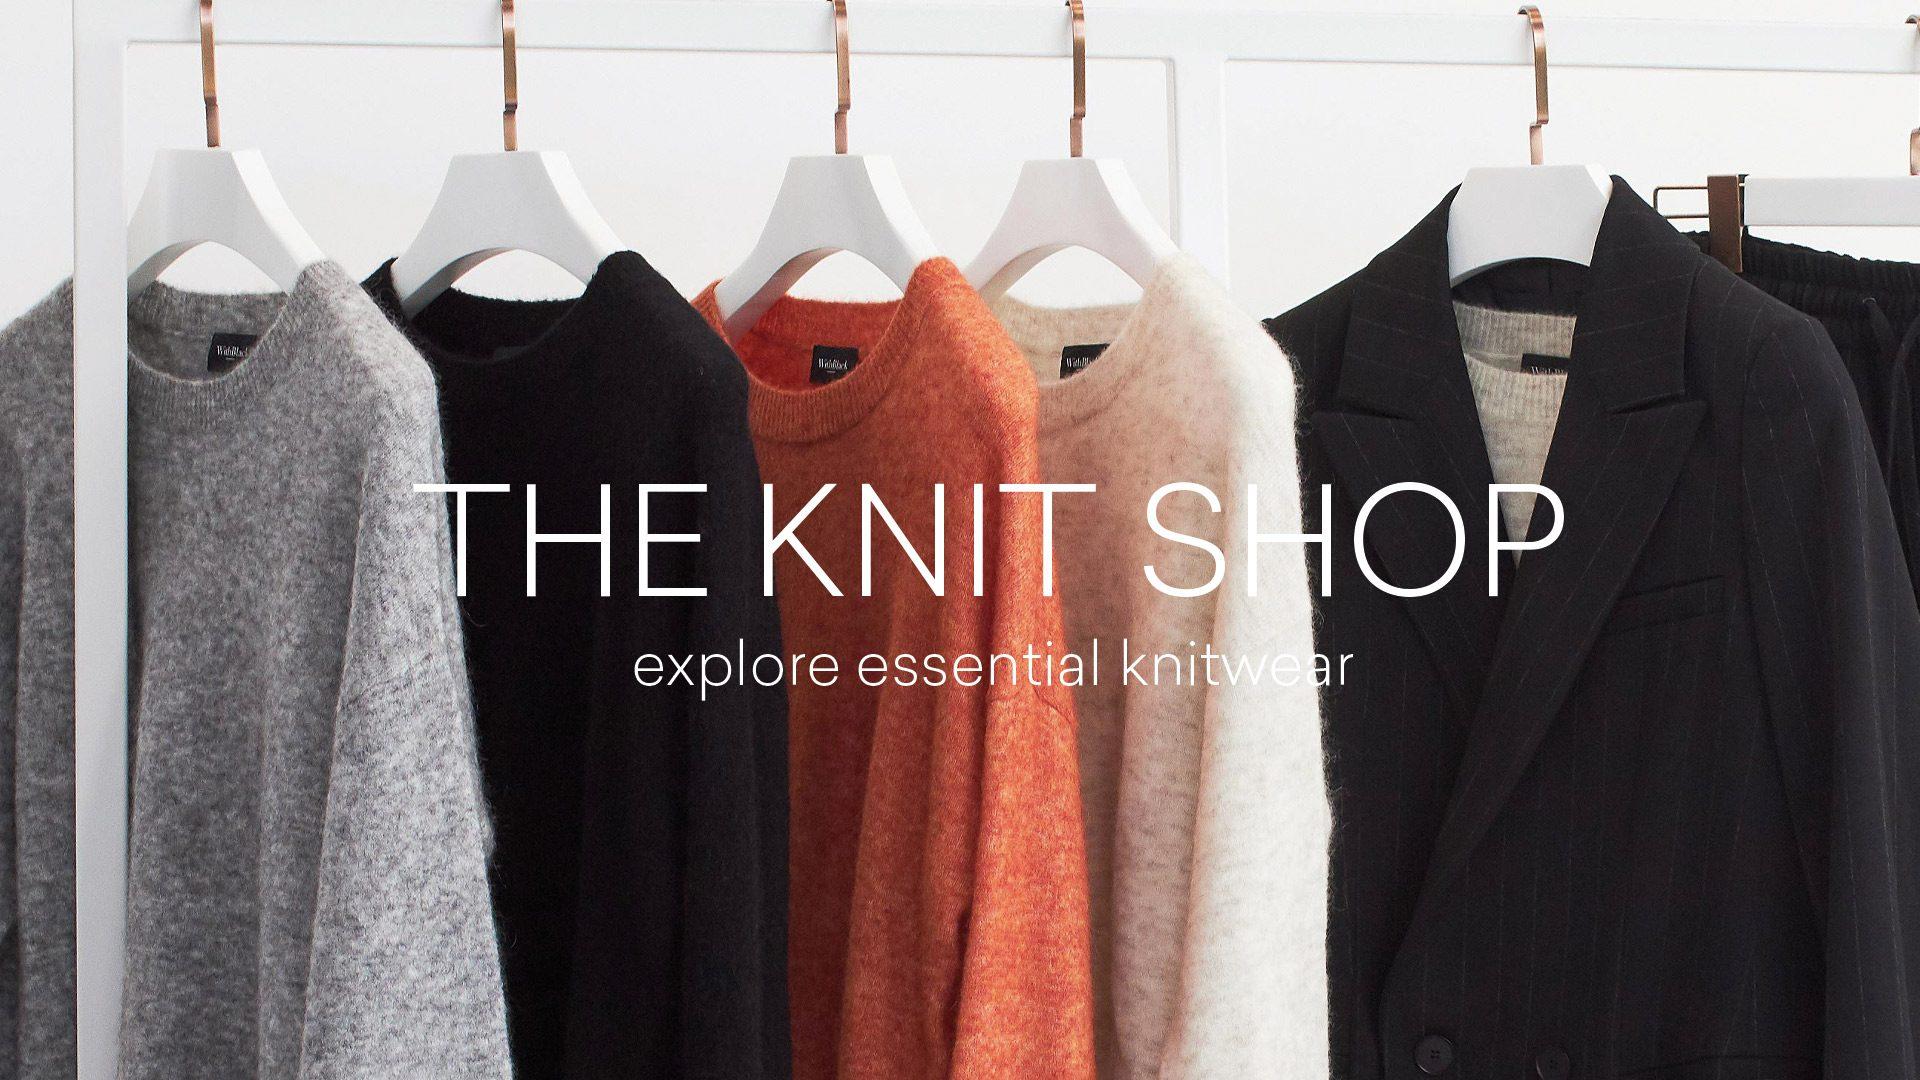 knitshop